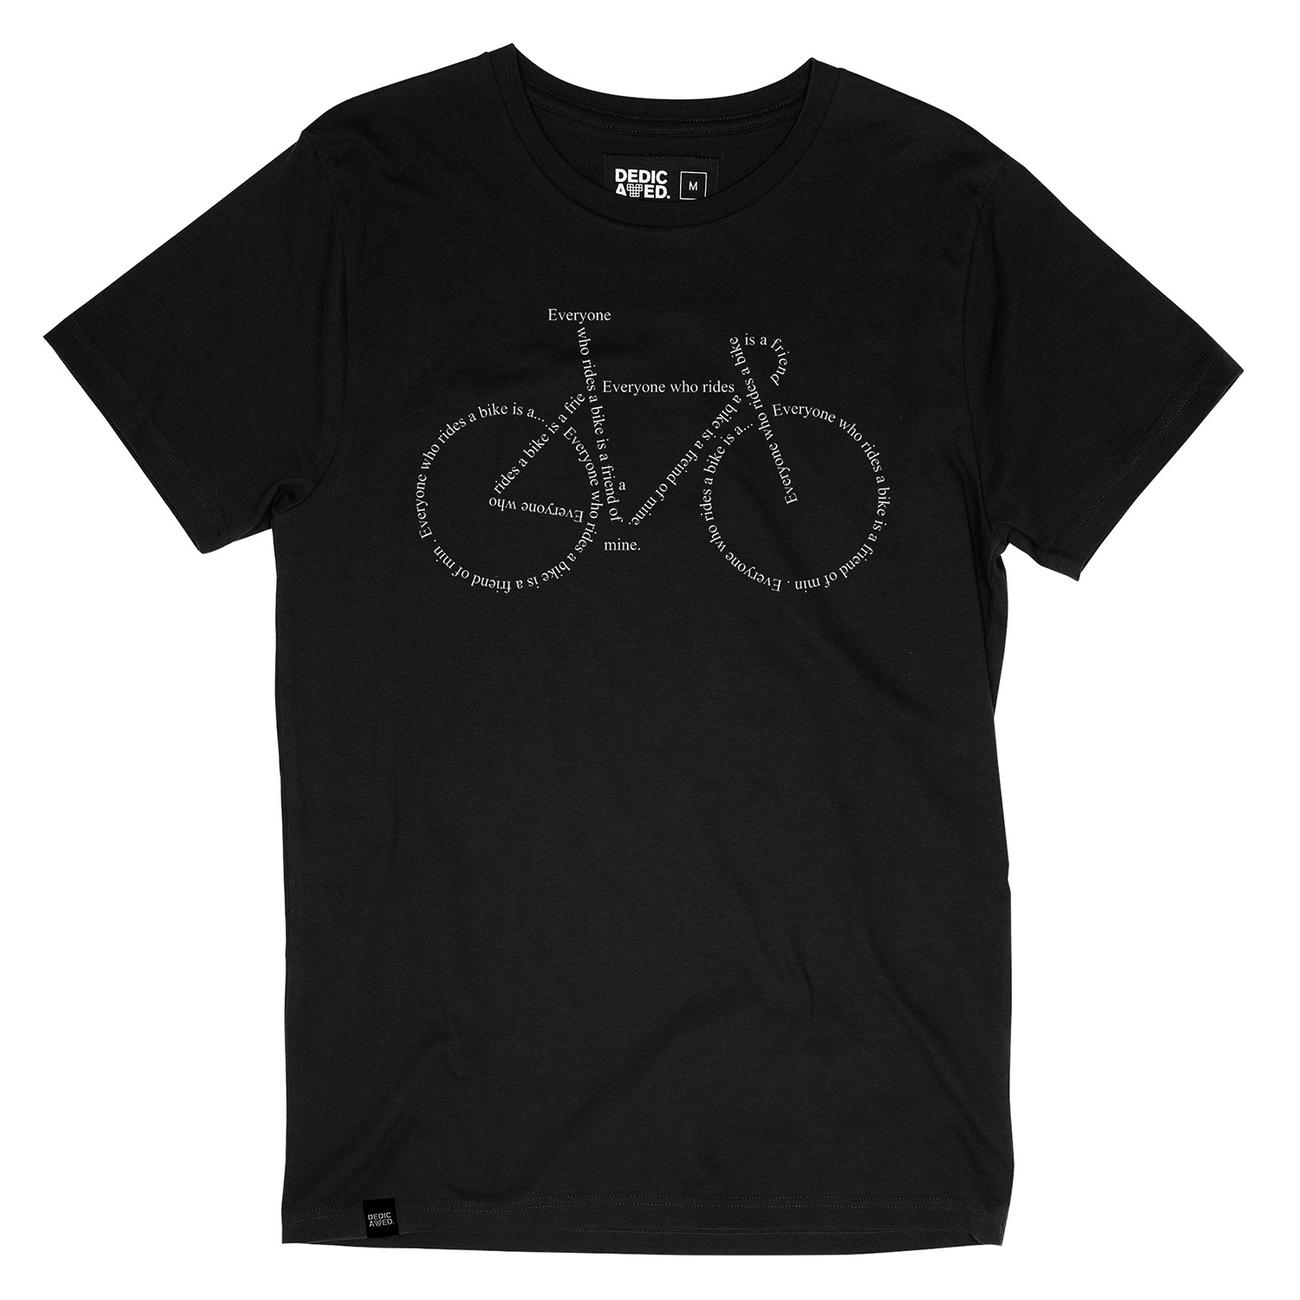 T-shirt Stockholm Text Bike